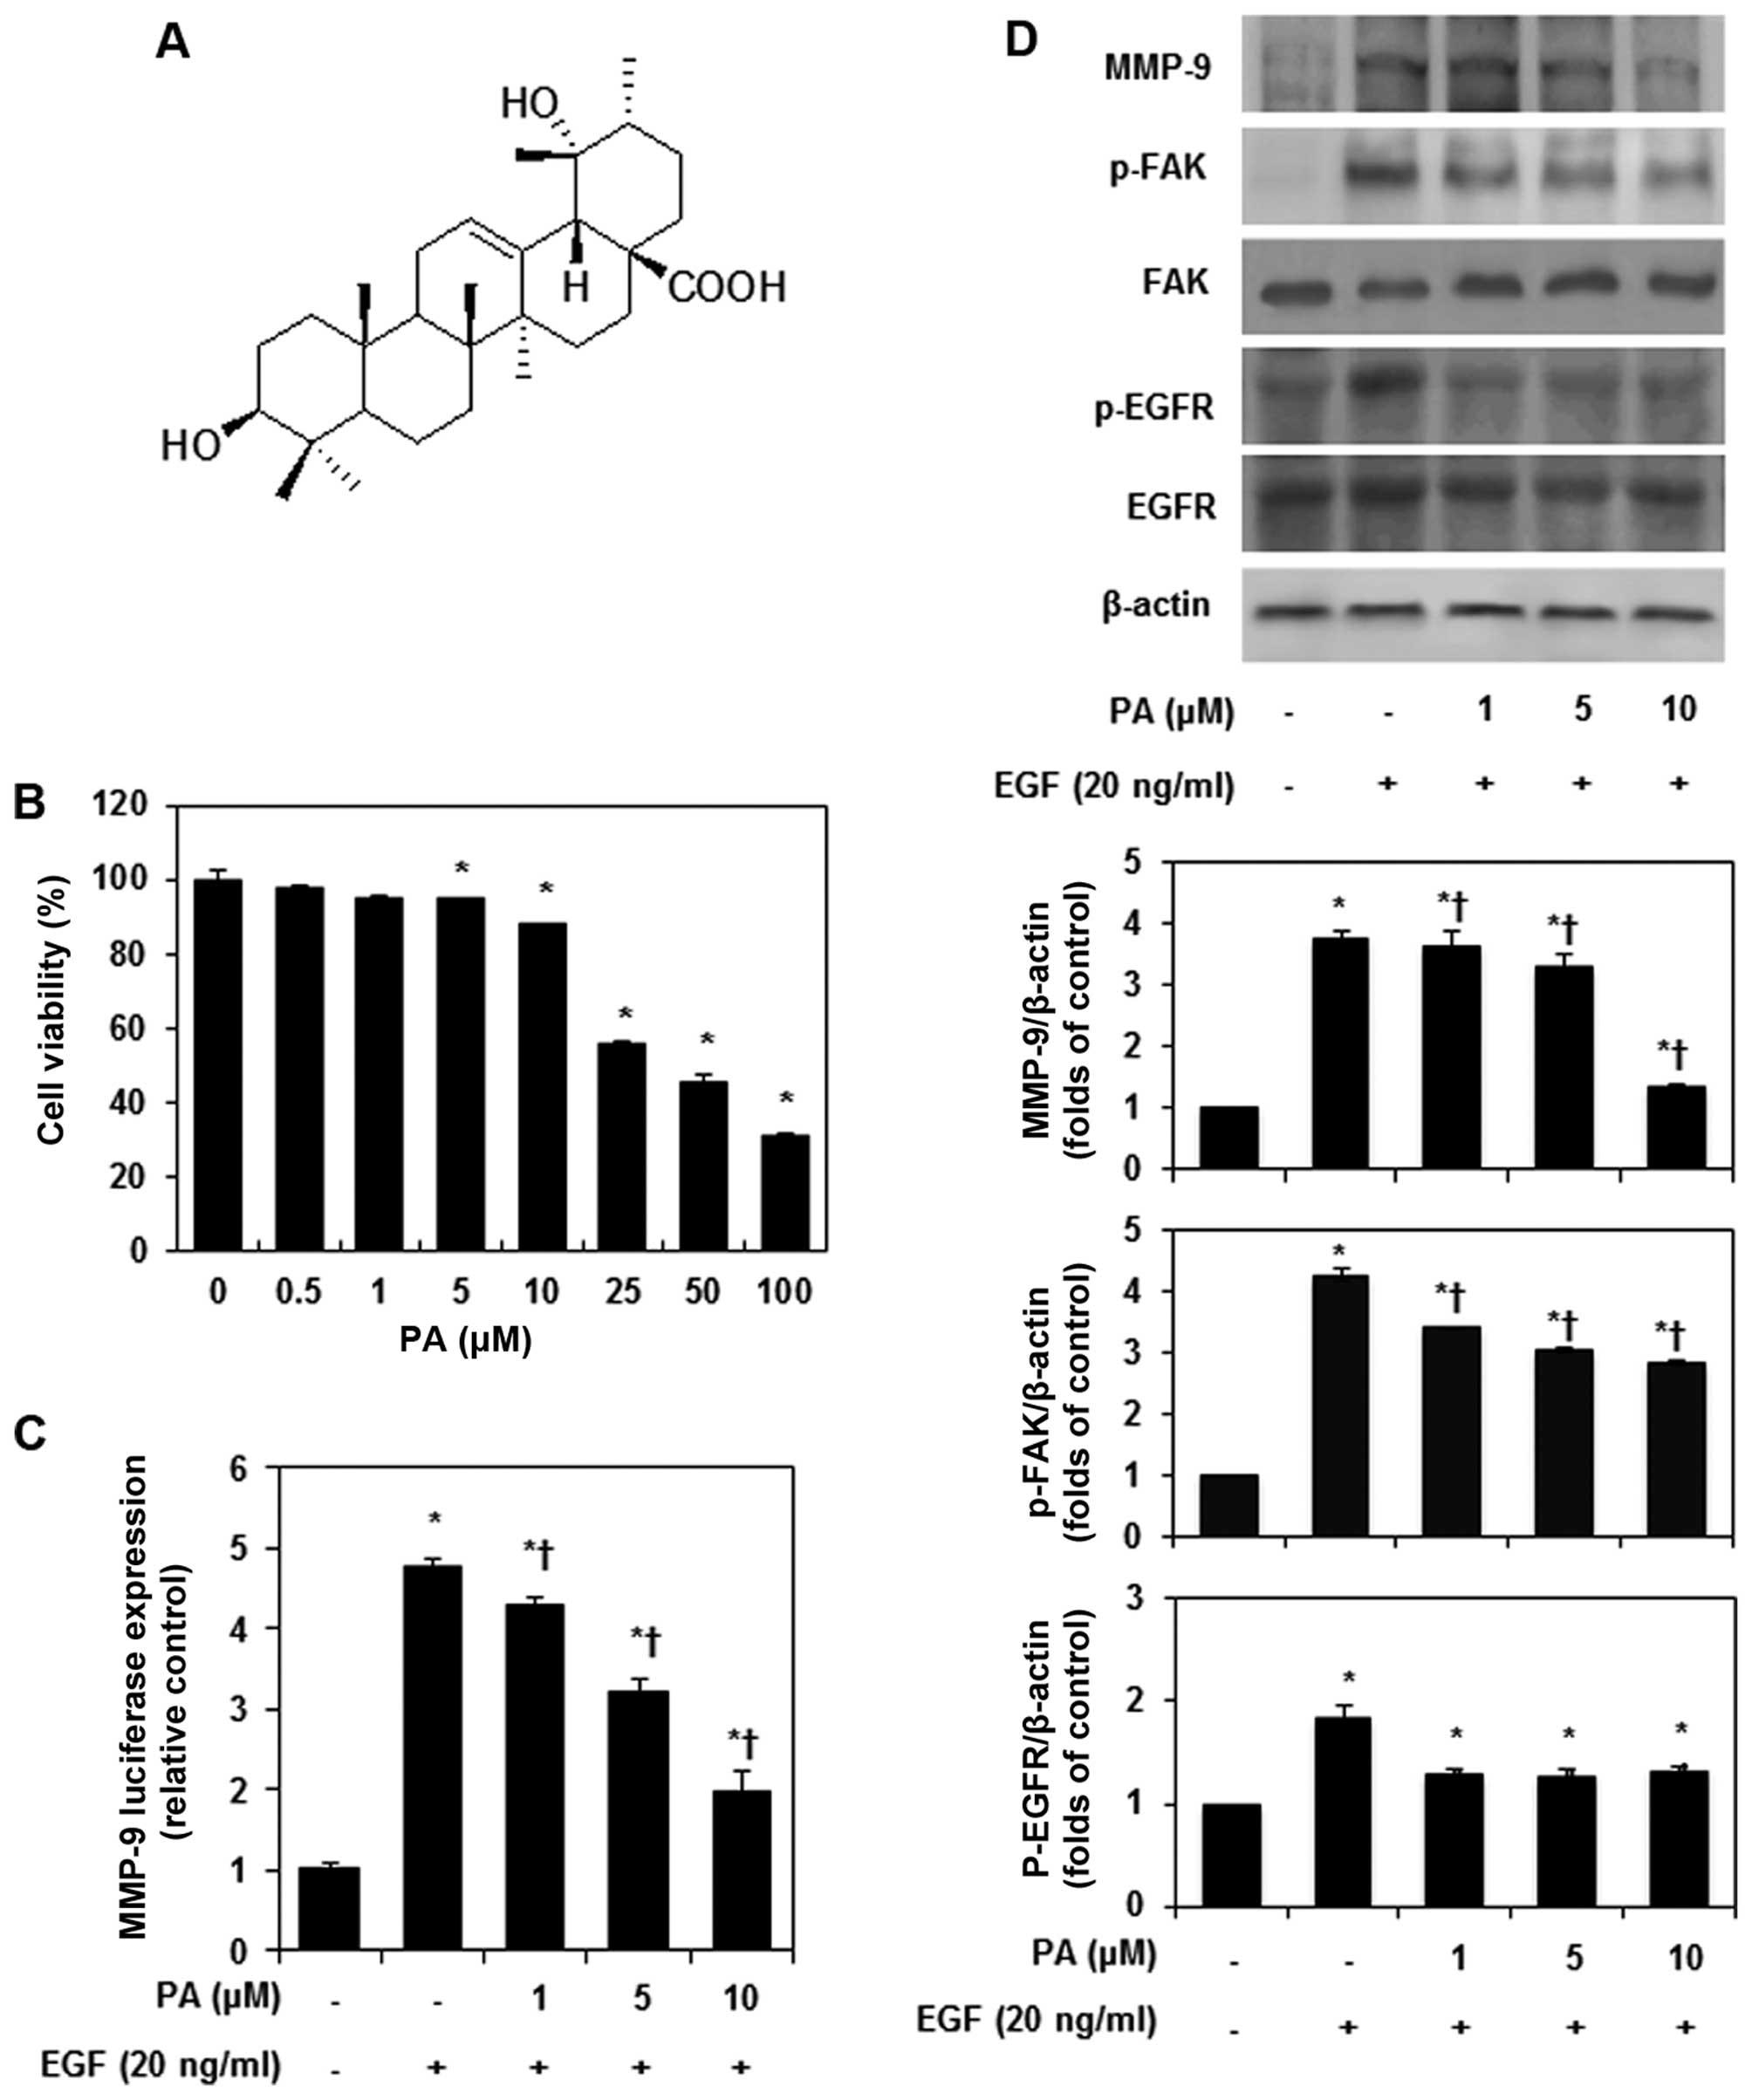 Suppression of MMP-9 and FAK expression by pomolic acid via blocking